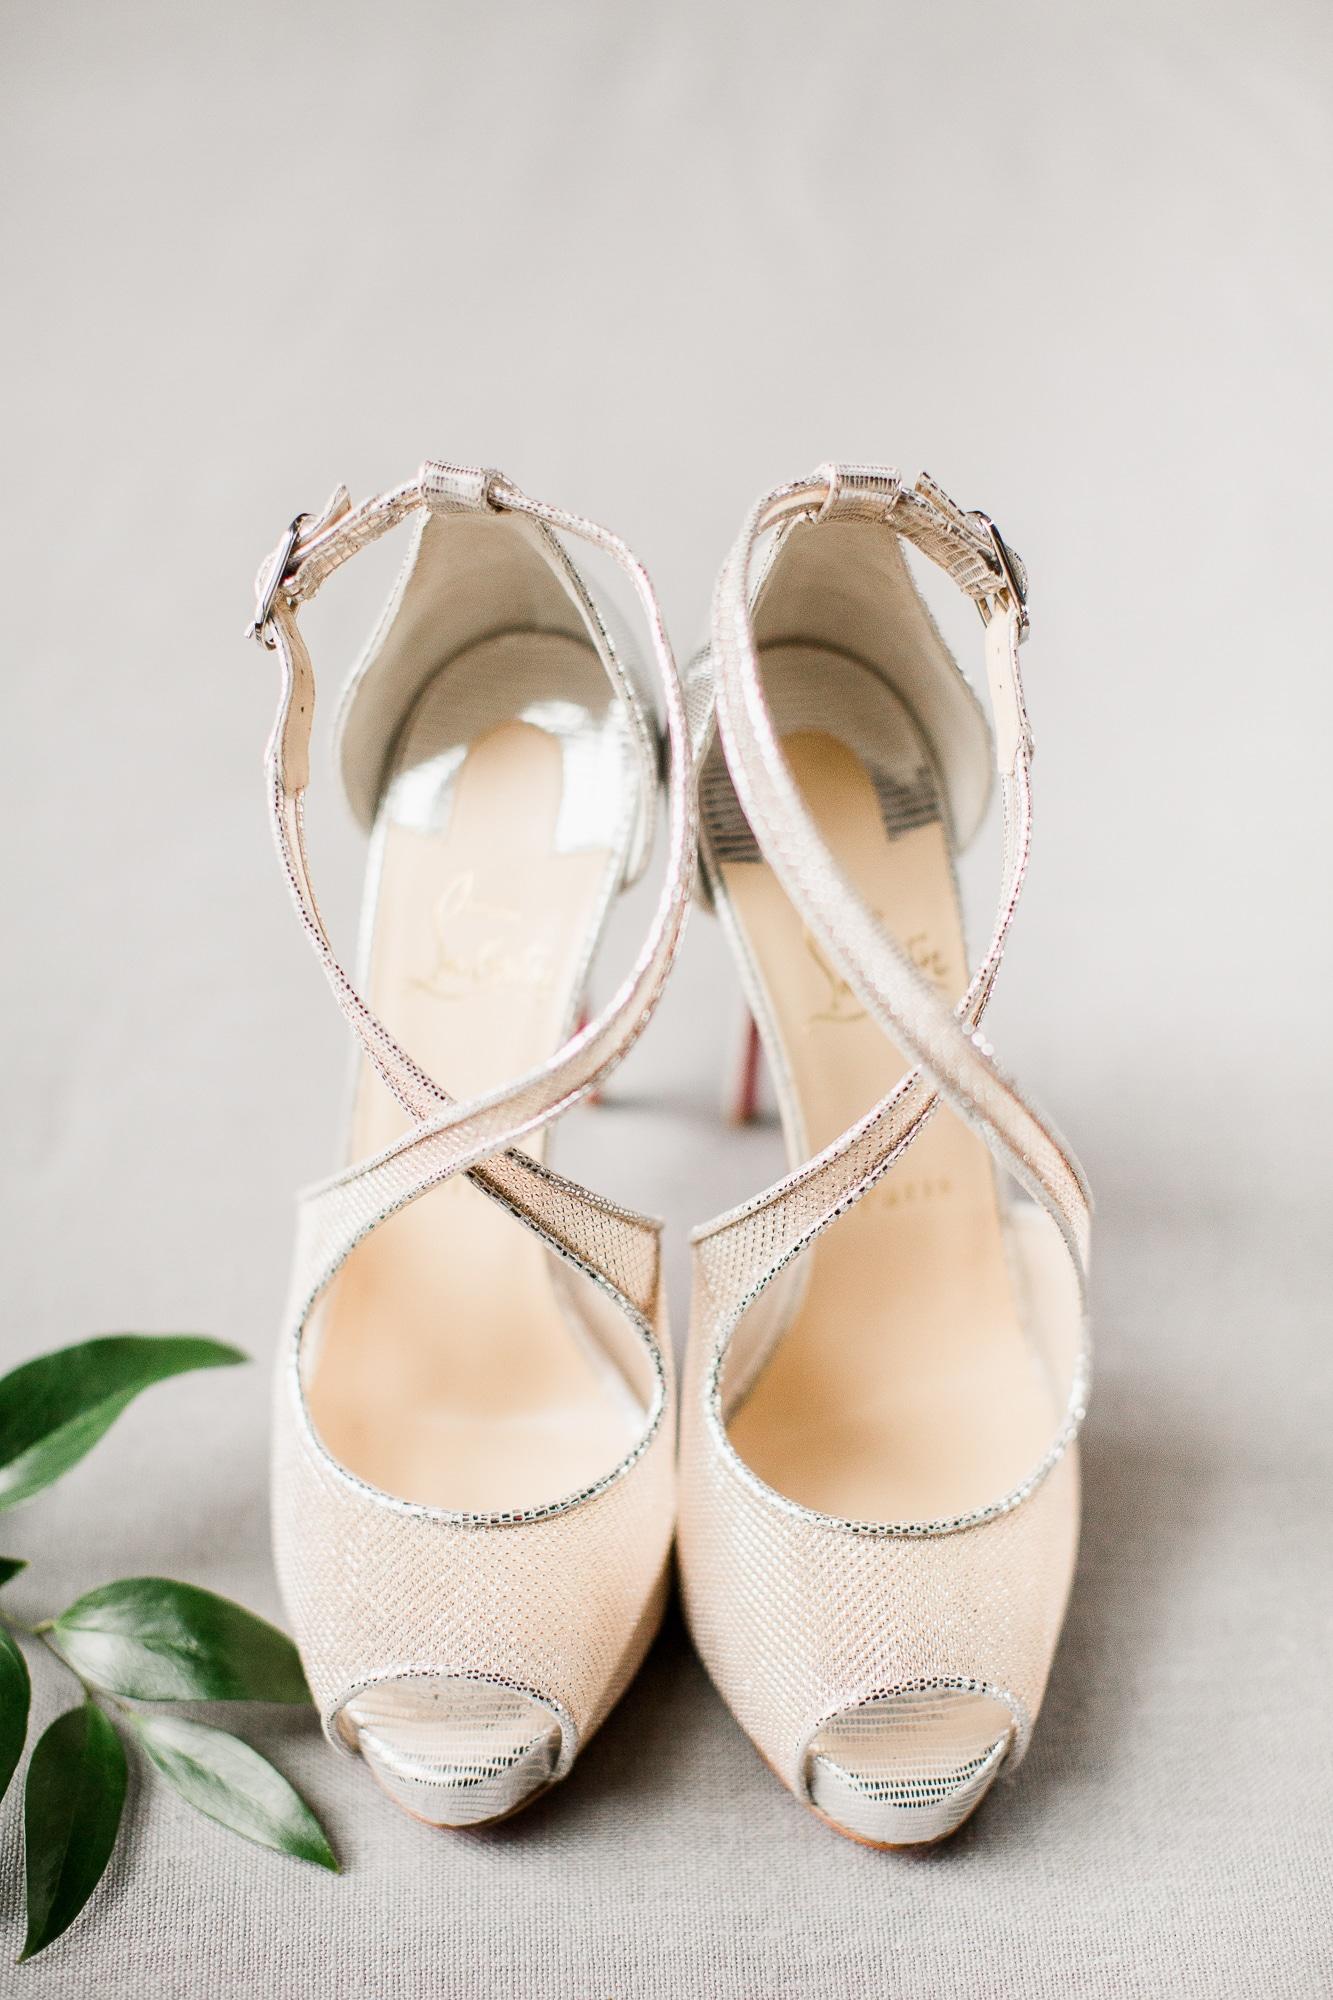 Christian Louboutin Bridal Shoes   Nashville Bride Guide